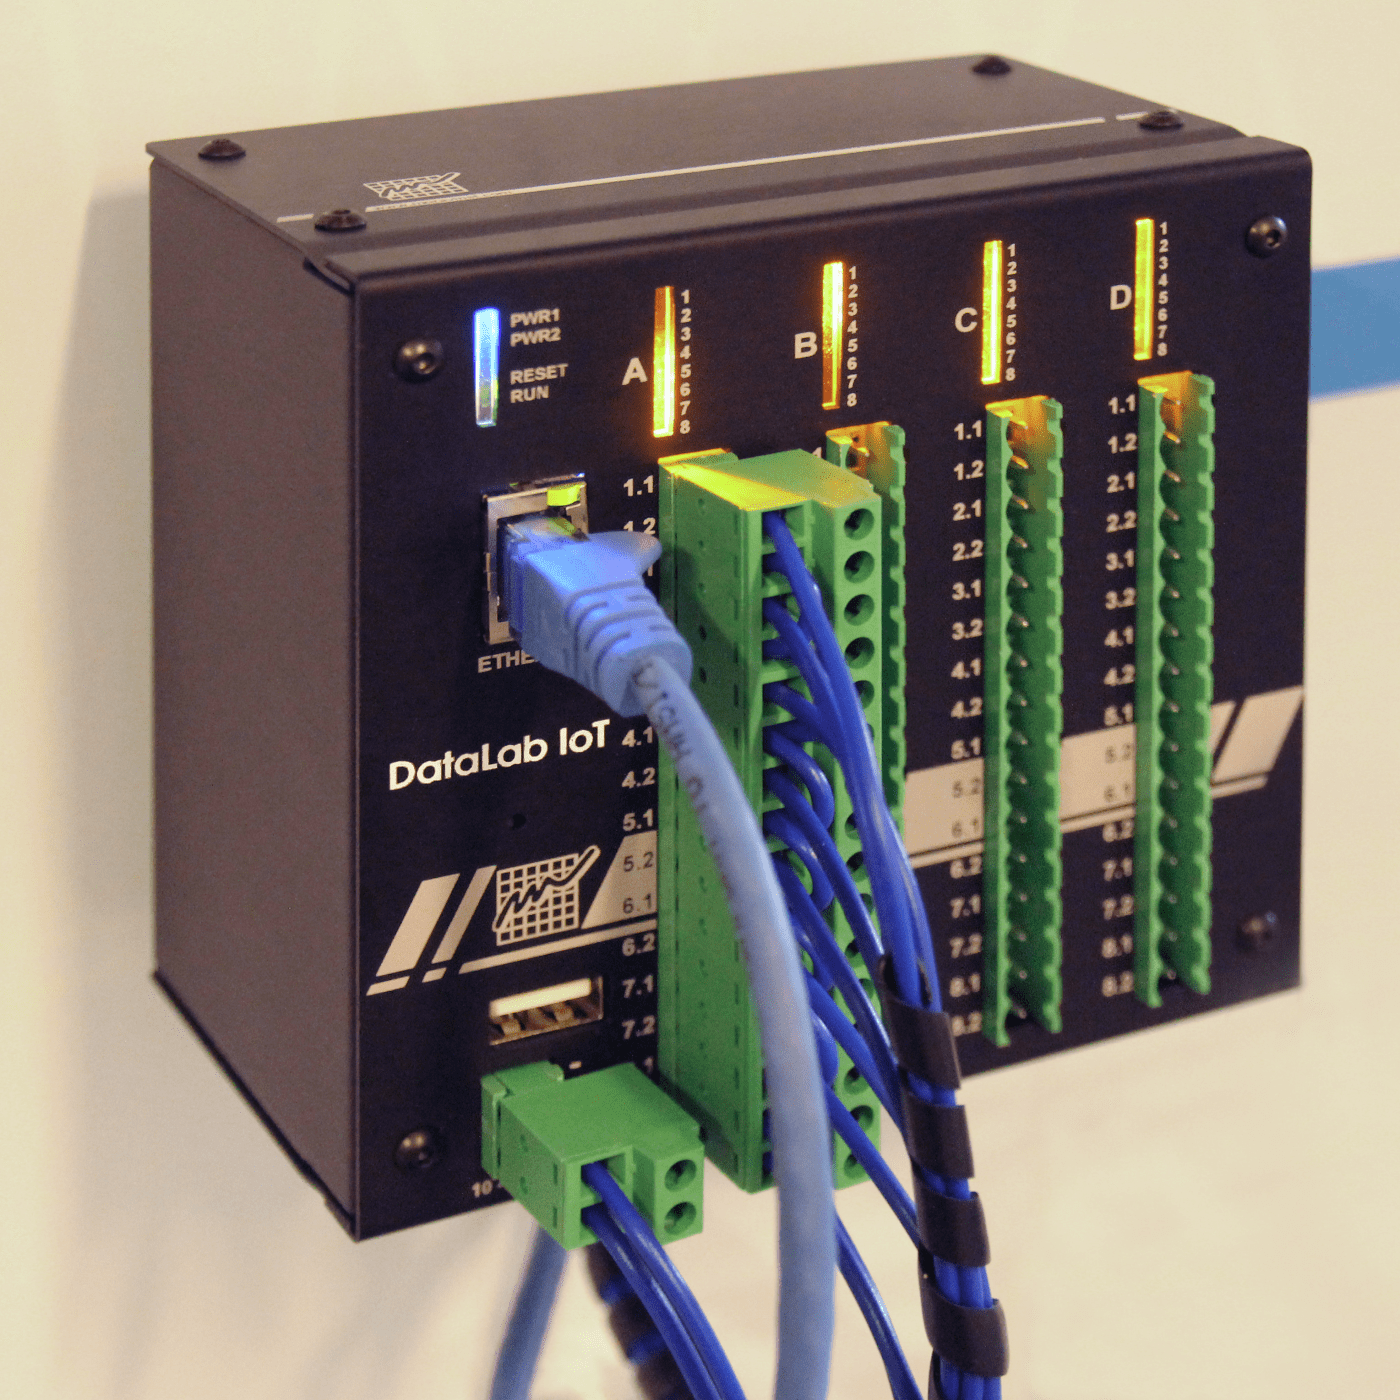 Datalab IoT